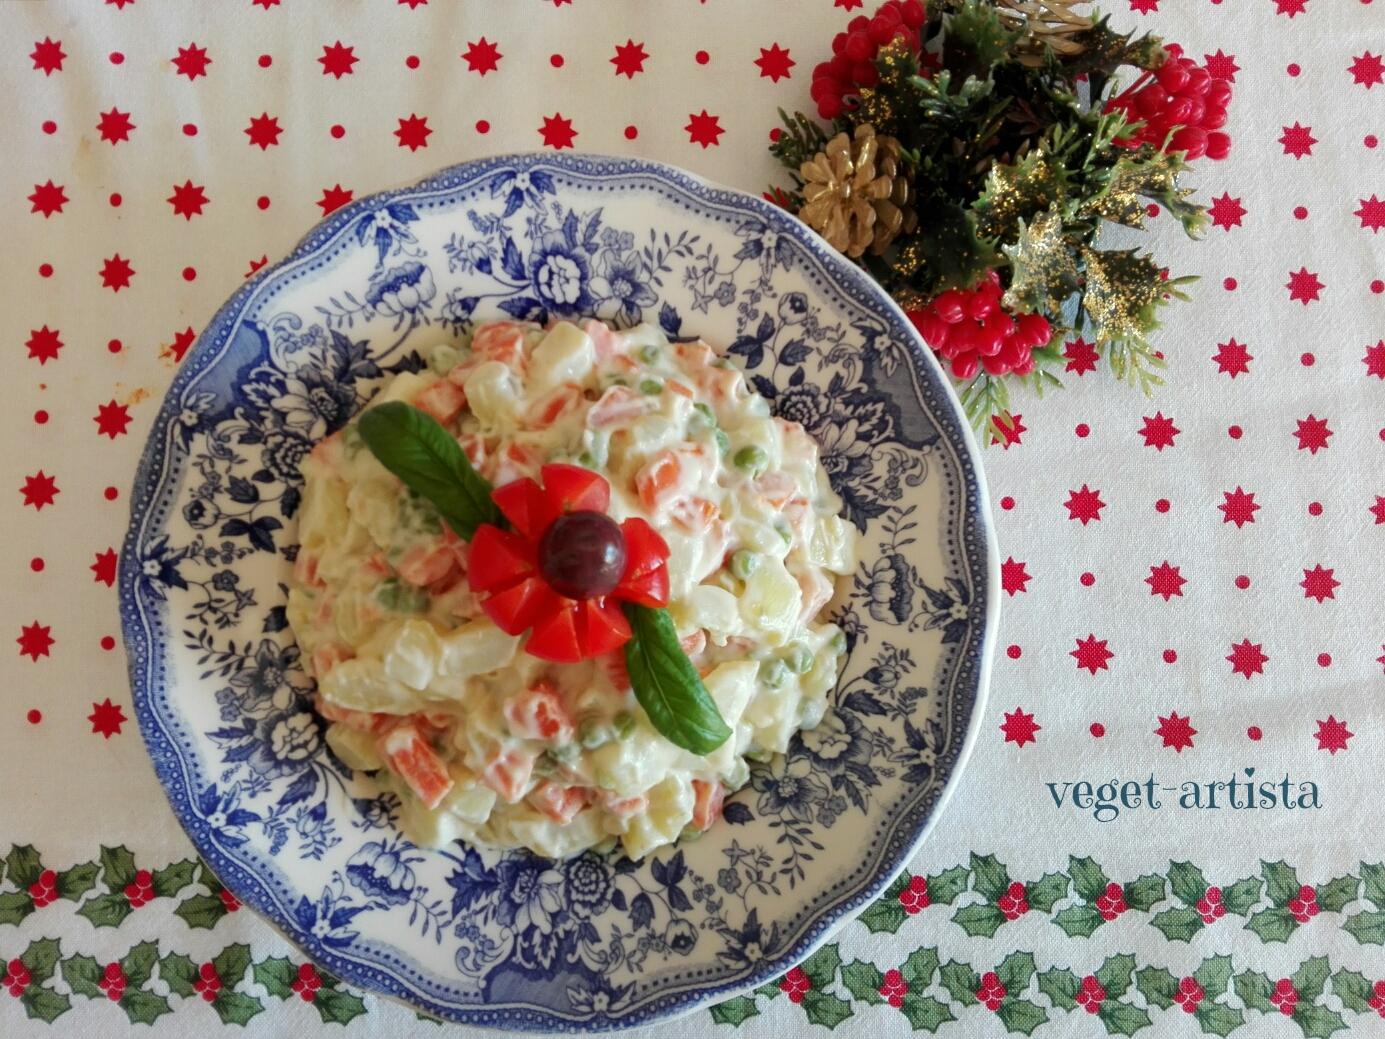 Insalata Russa Vegan (Russian Salad)